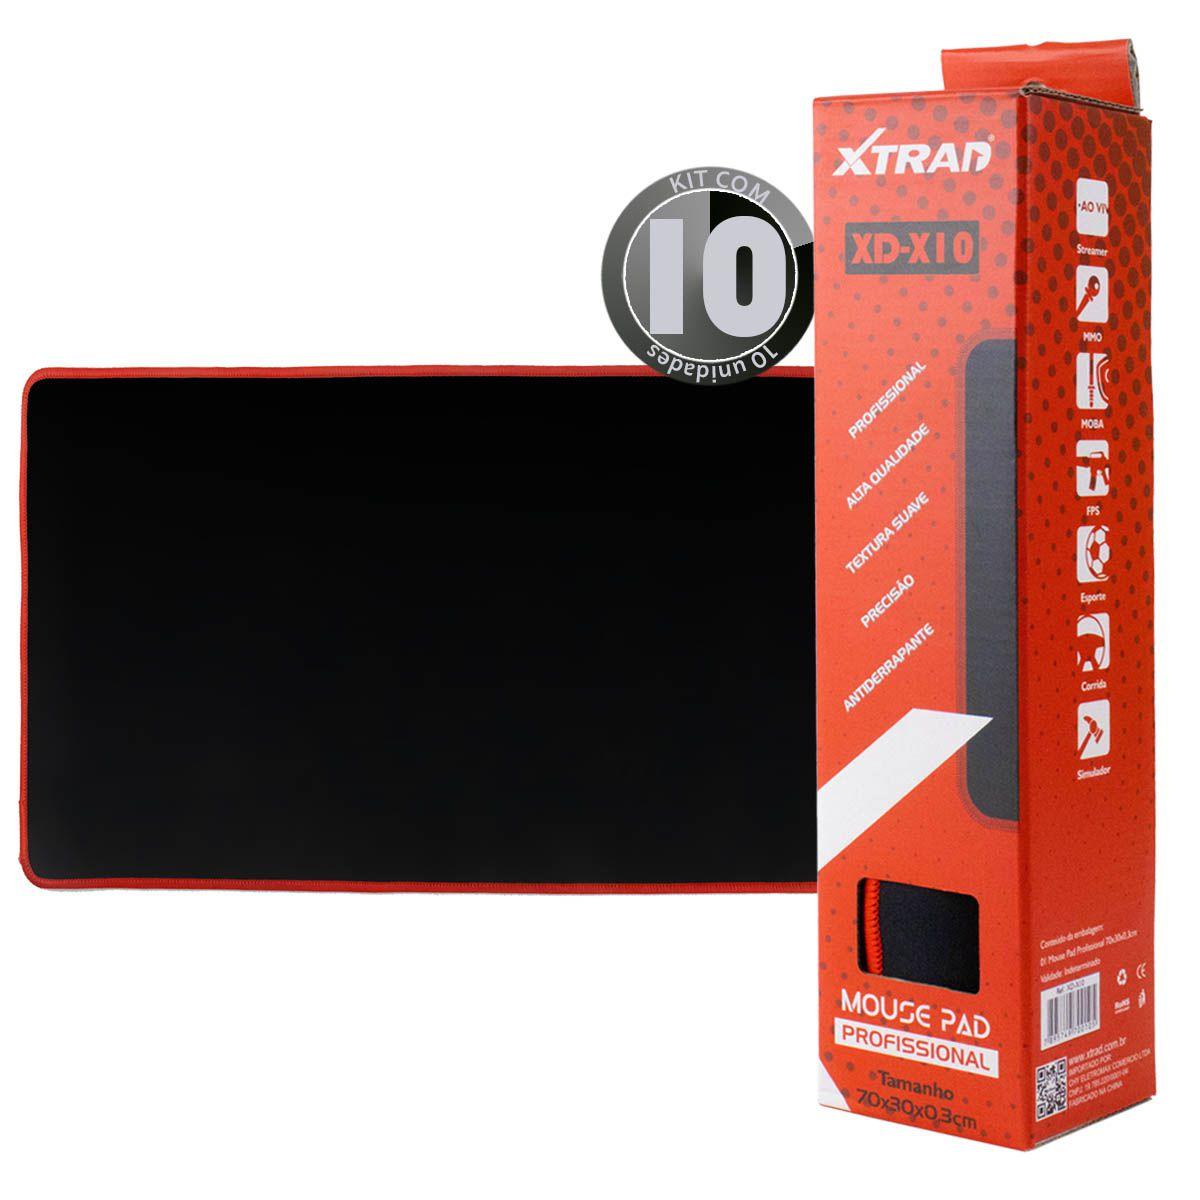 KIT 10x Mouse Pad Gamer Preto Xtrad XD-X10 Extra Grande 70x30cm